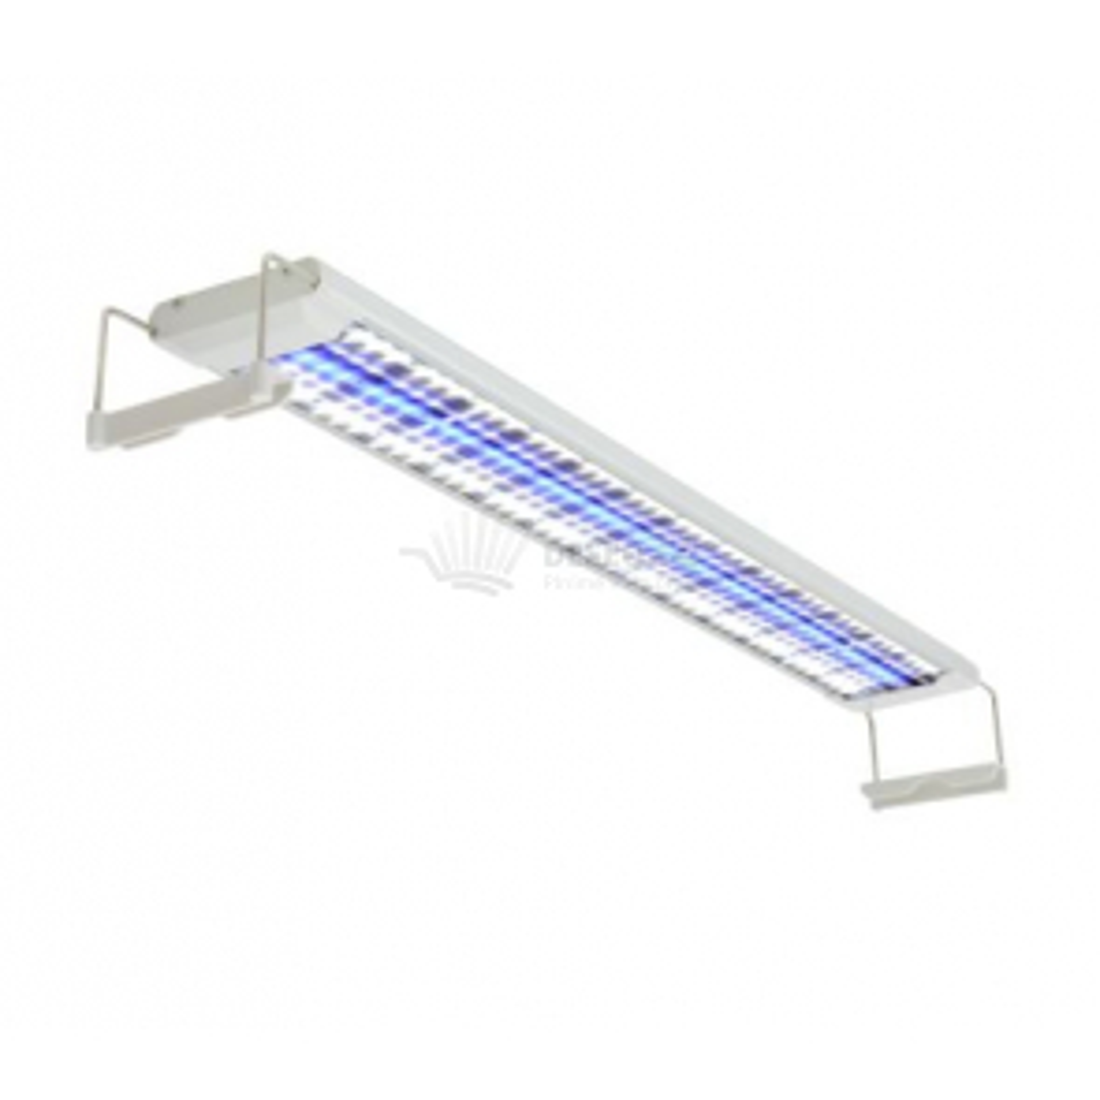 LED osvetlenie akvária, 80 - 90 cm, IP 67